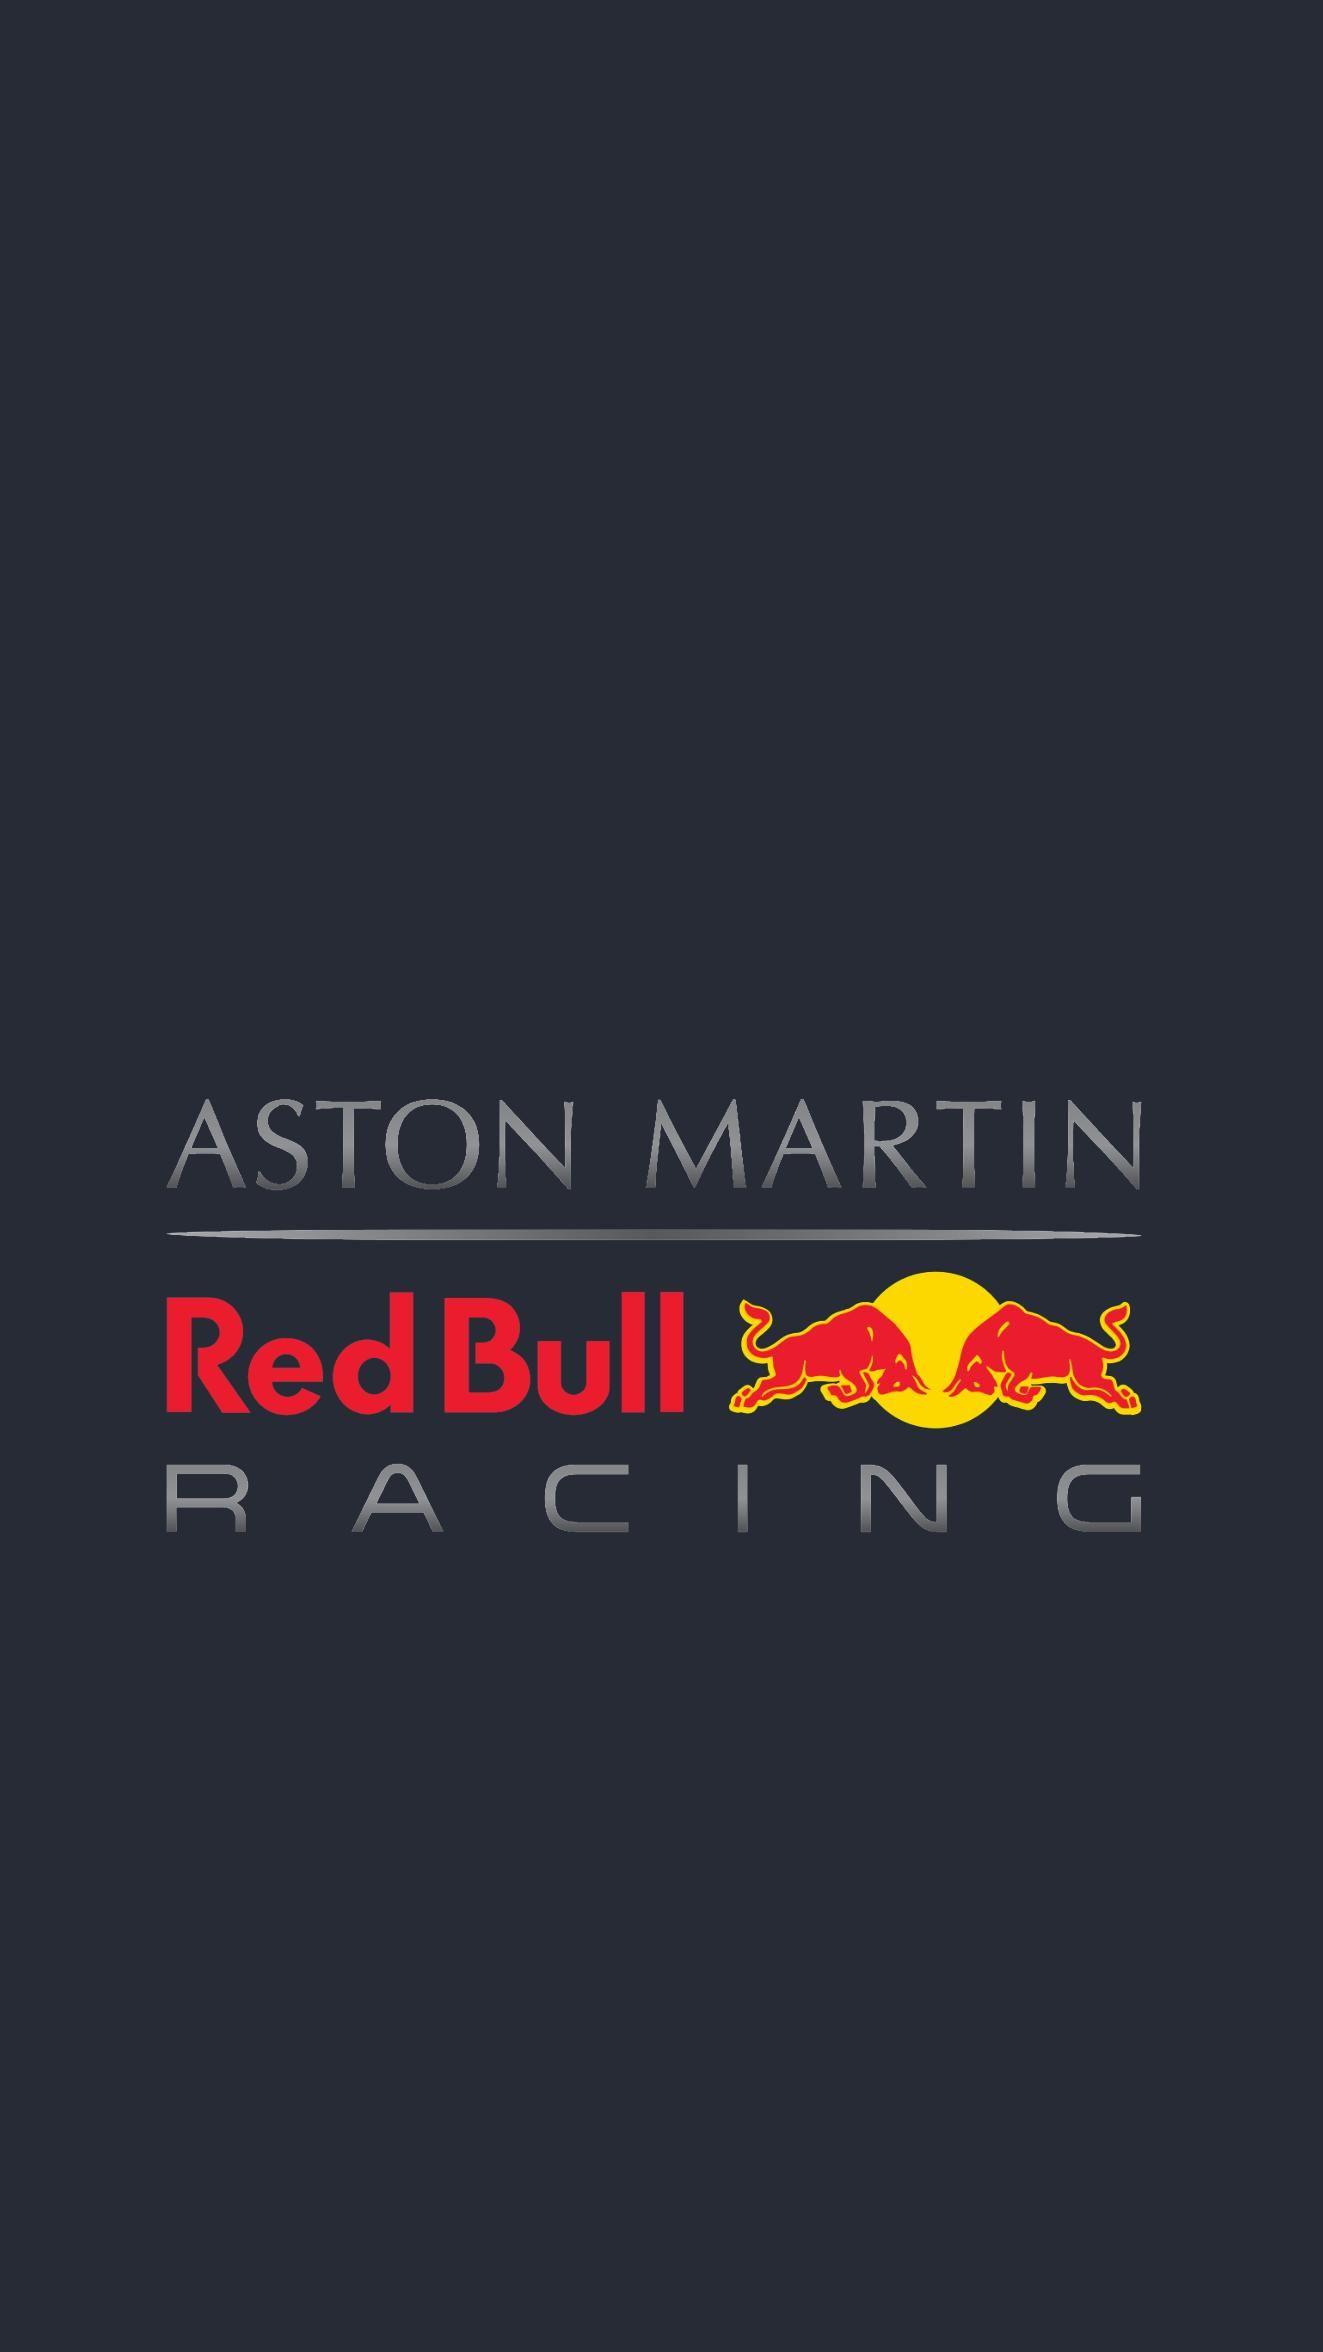 Aston Martin Red Bull Racing Wallpaper Color Autos